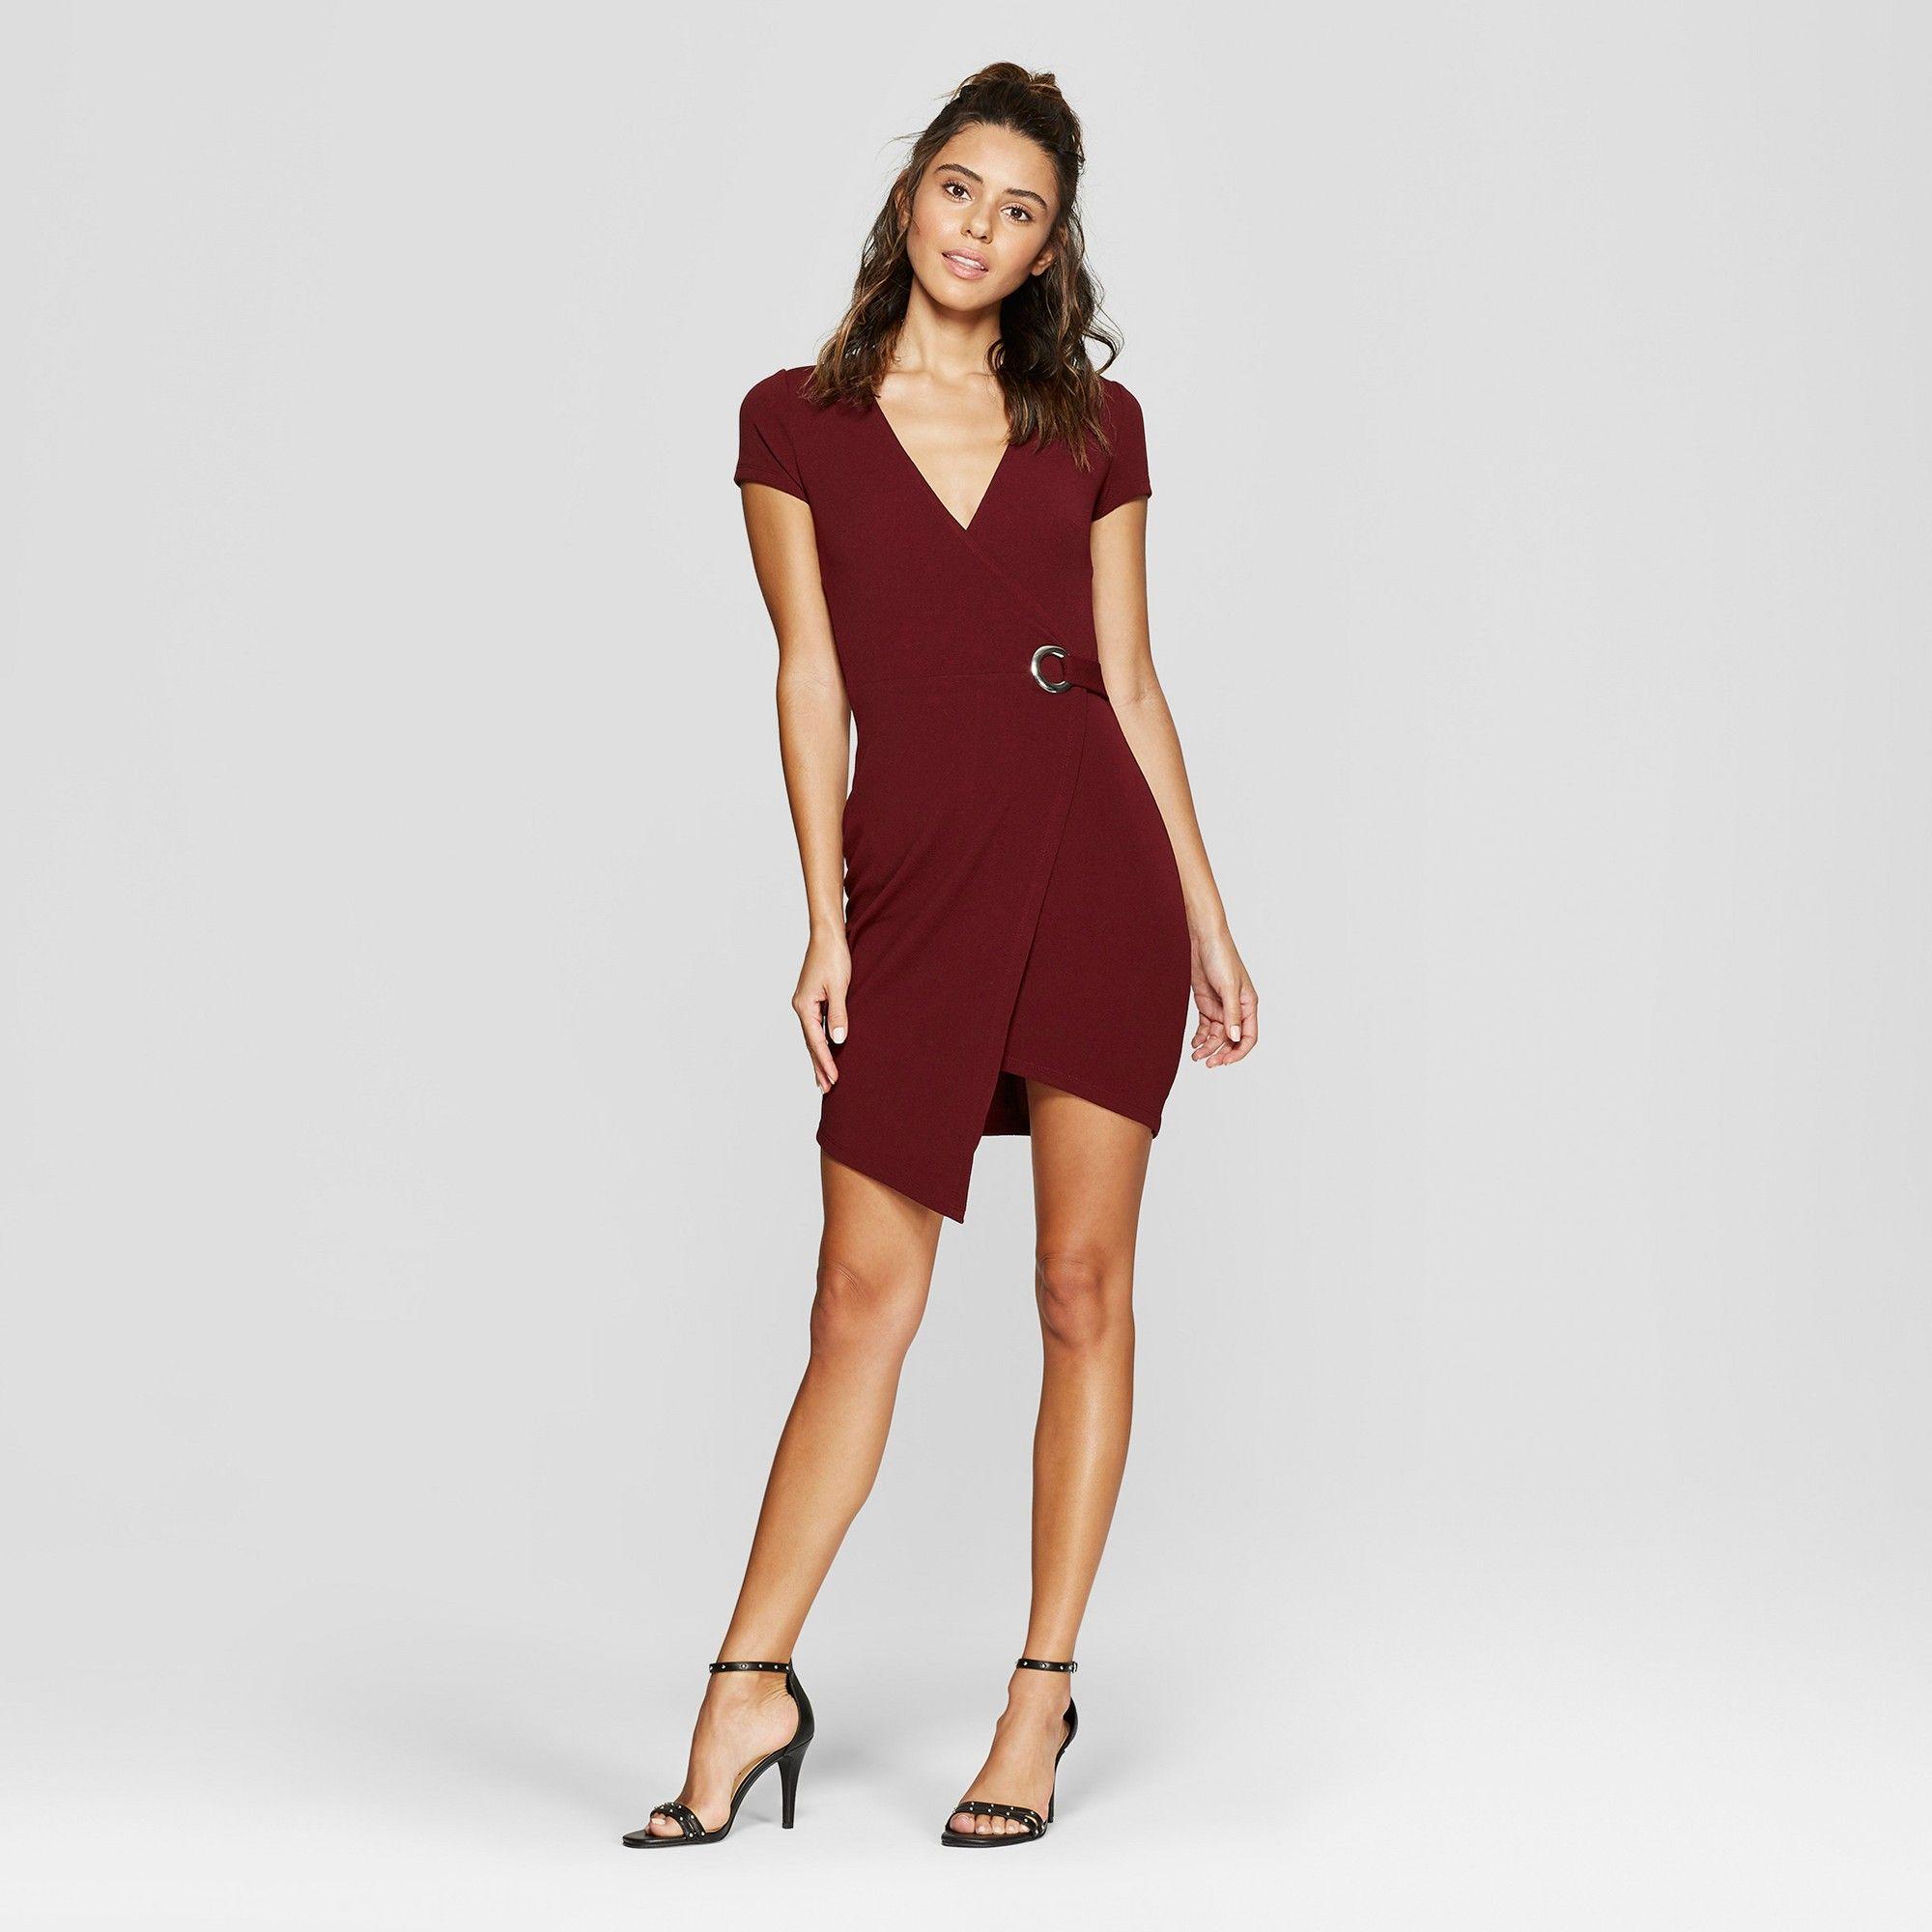 119fcf21a Women's Short Sleeve Wrap Dress - Almost Famous (Juniors') Burgundy XL, Red